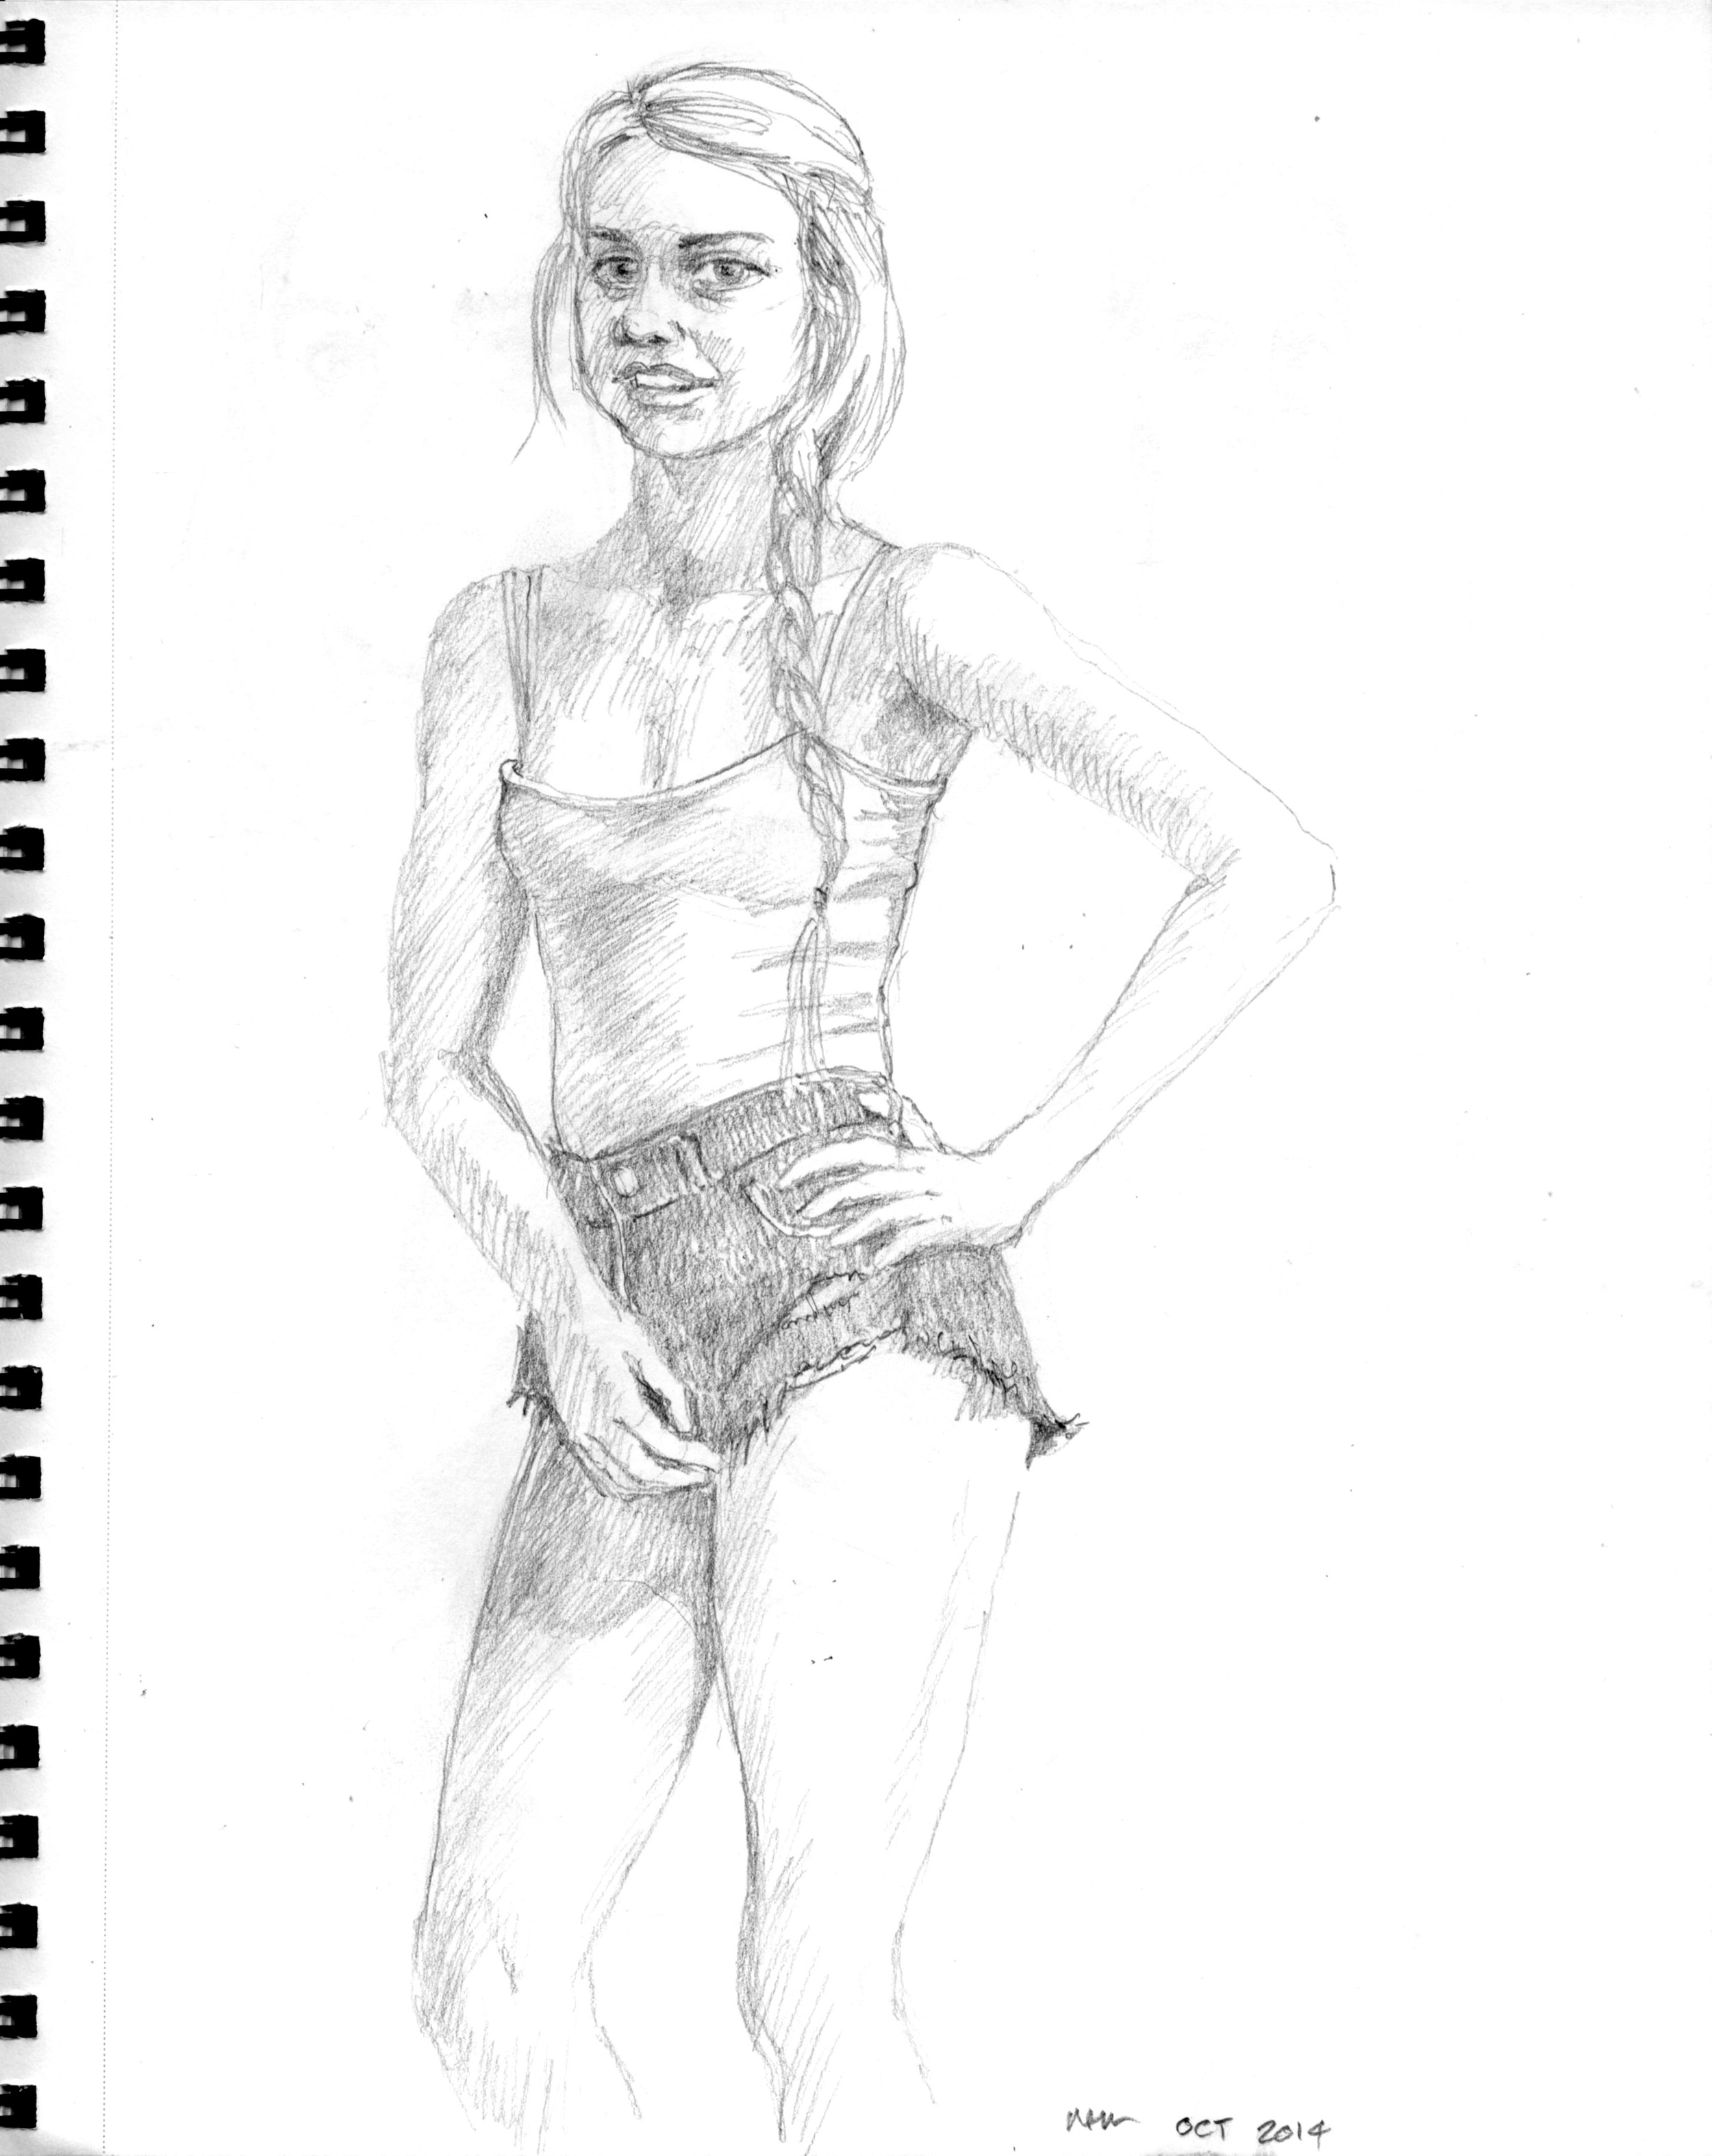 October 2014 sketches